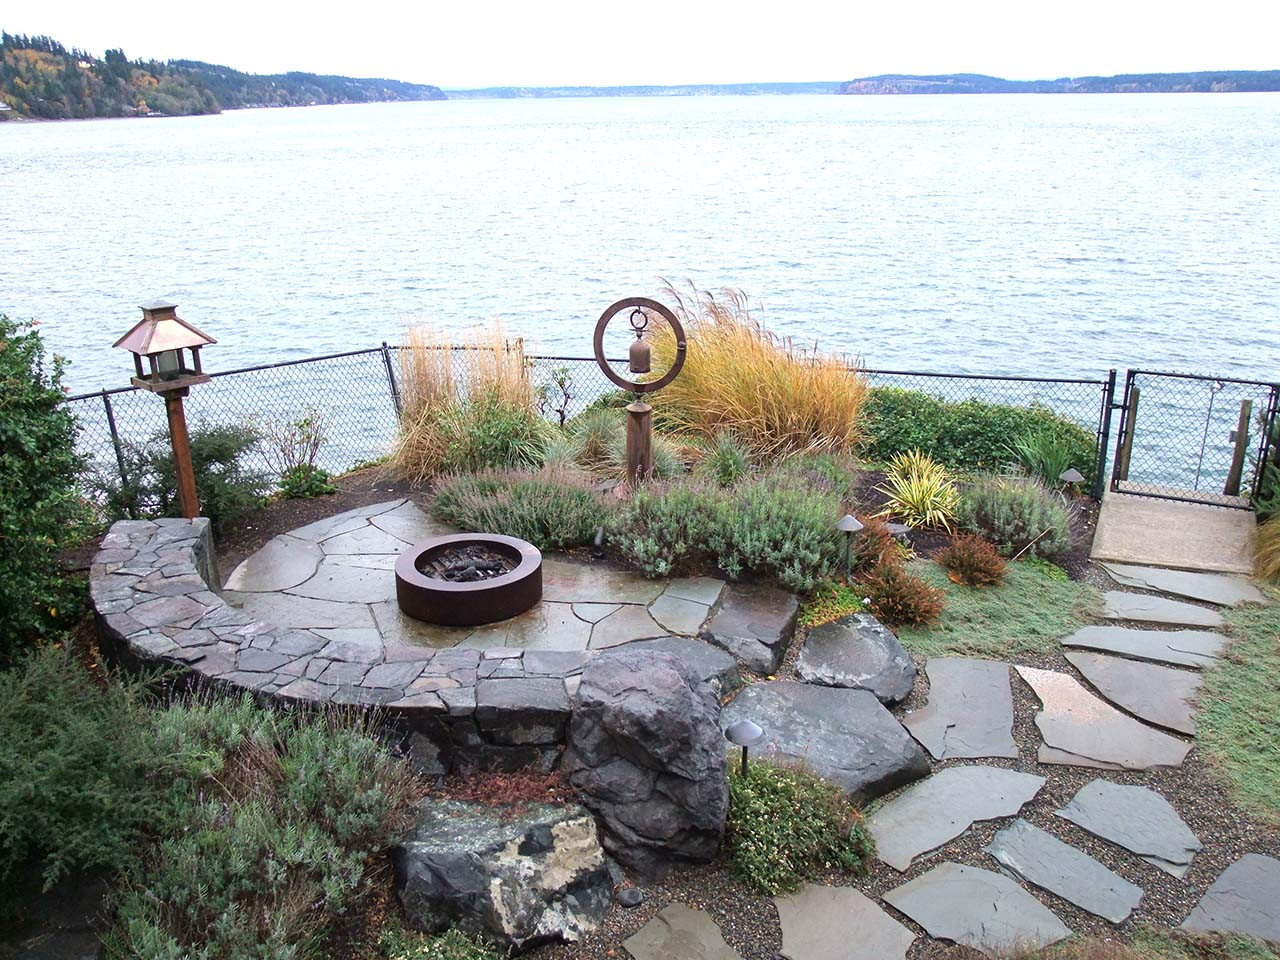 Gig Harbor Overlook